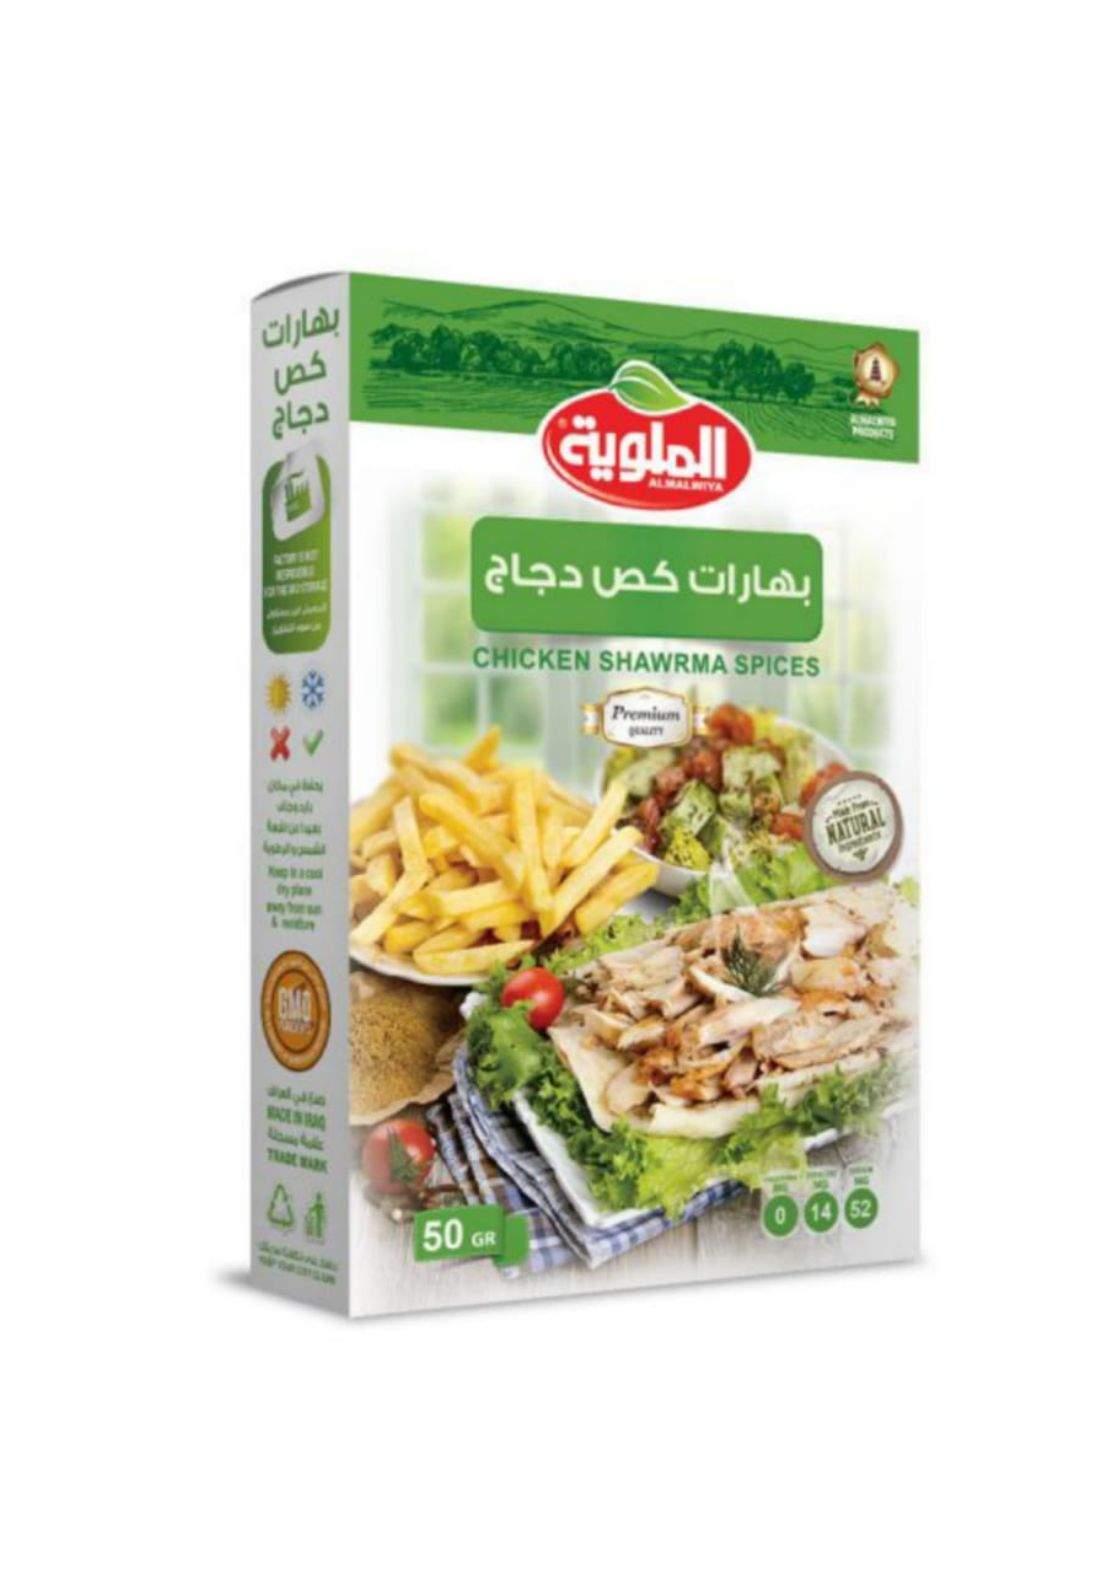 Al-Malwiya Chicken Shawrma Spices بهارات كص دجاج الملوية